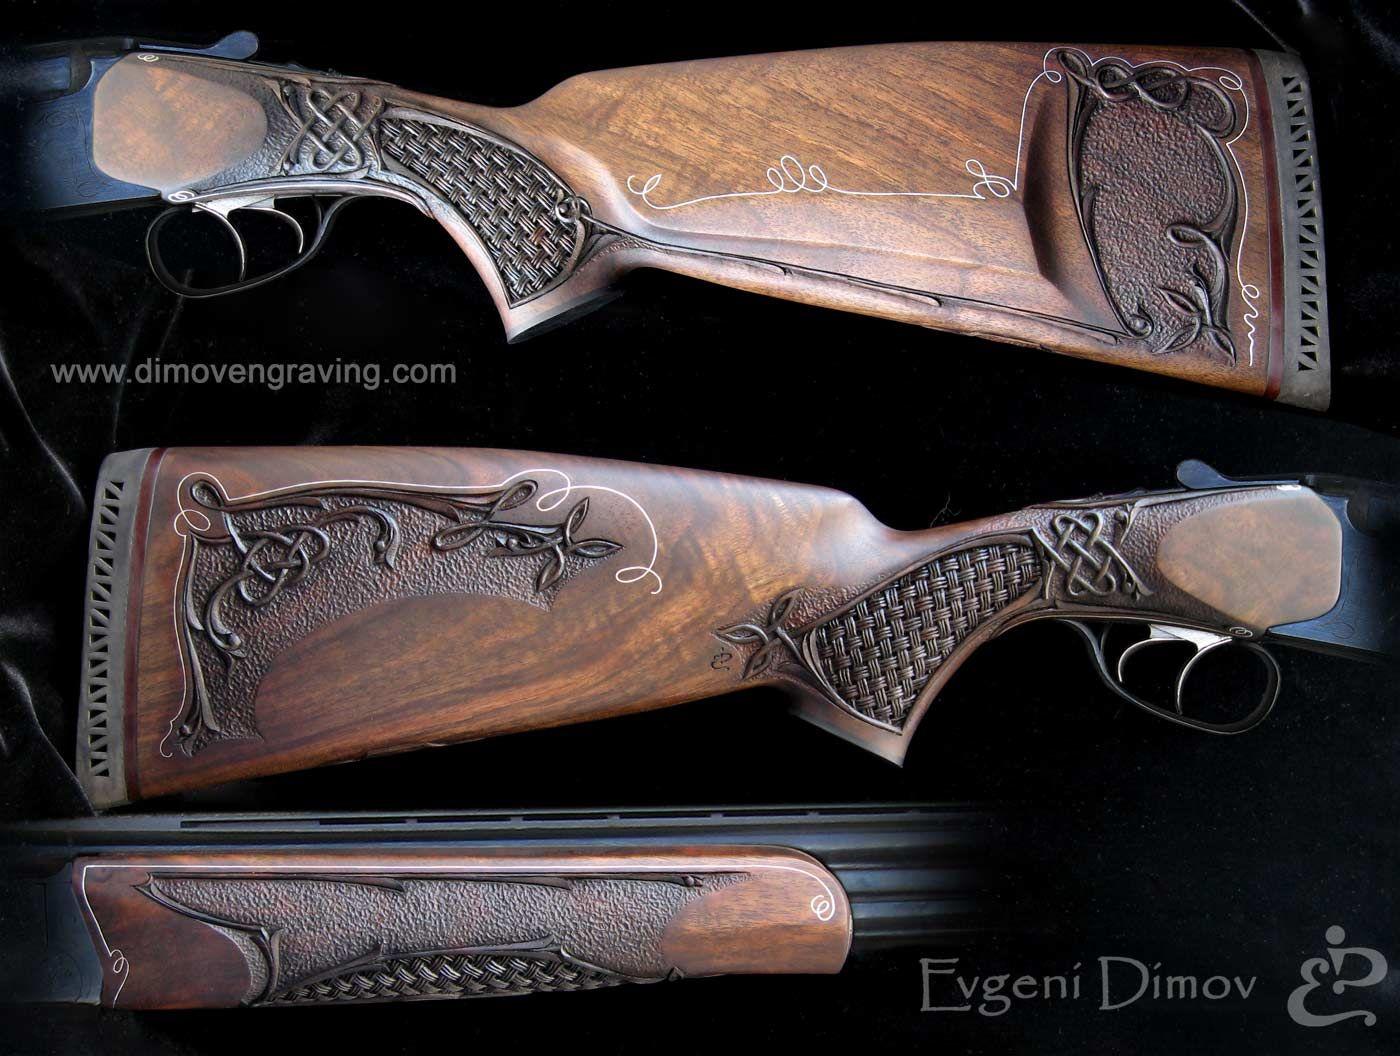 Gallery gunstocks evgeni dimov hand engraving great